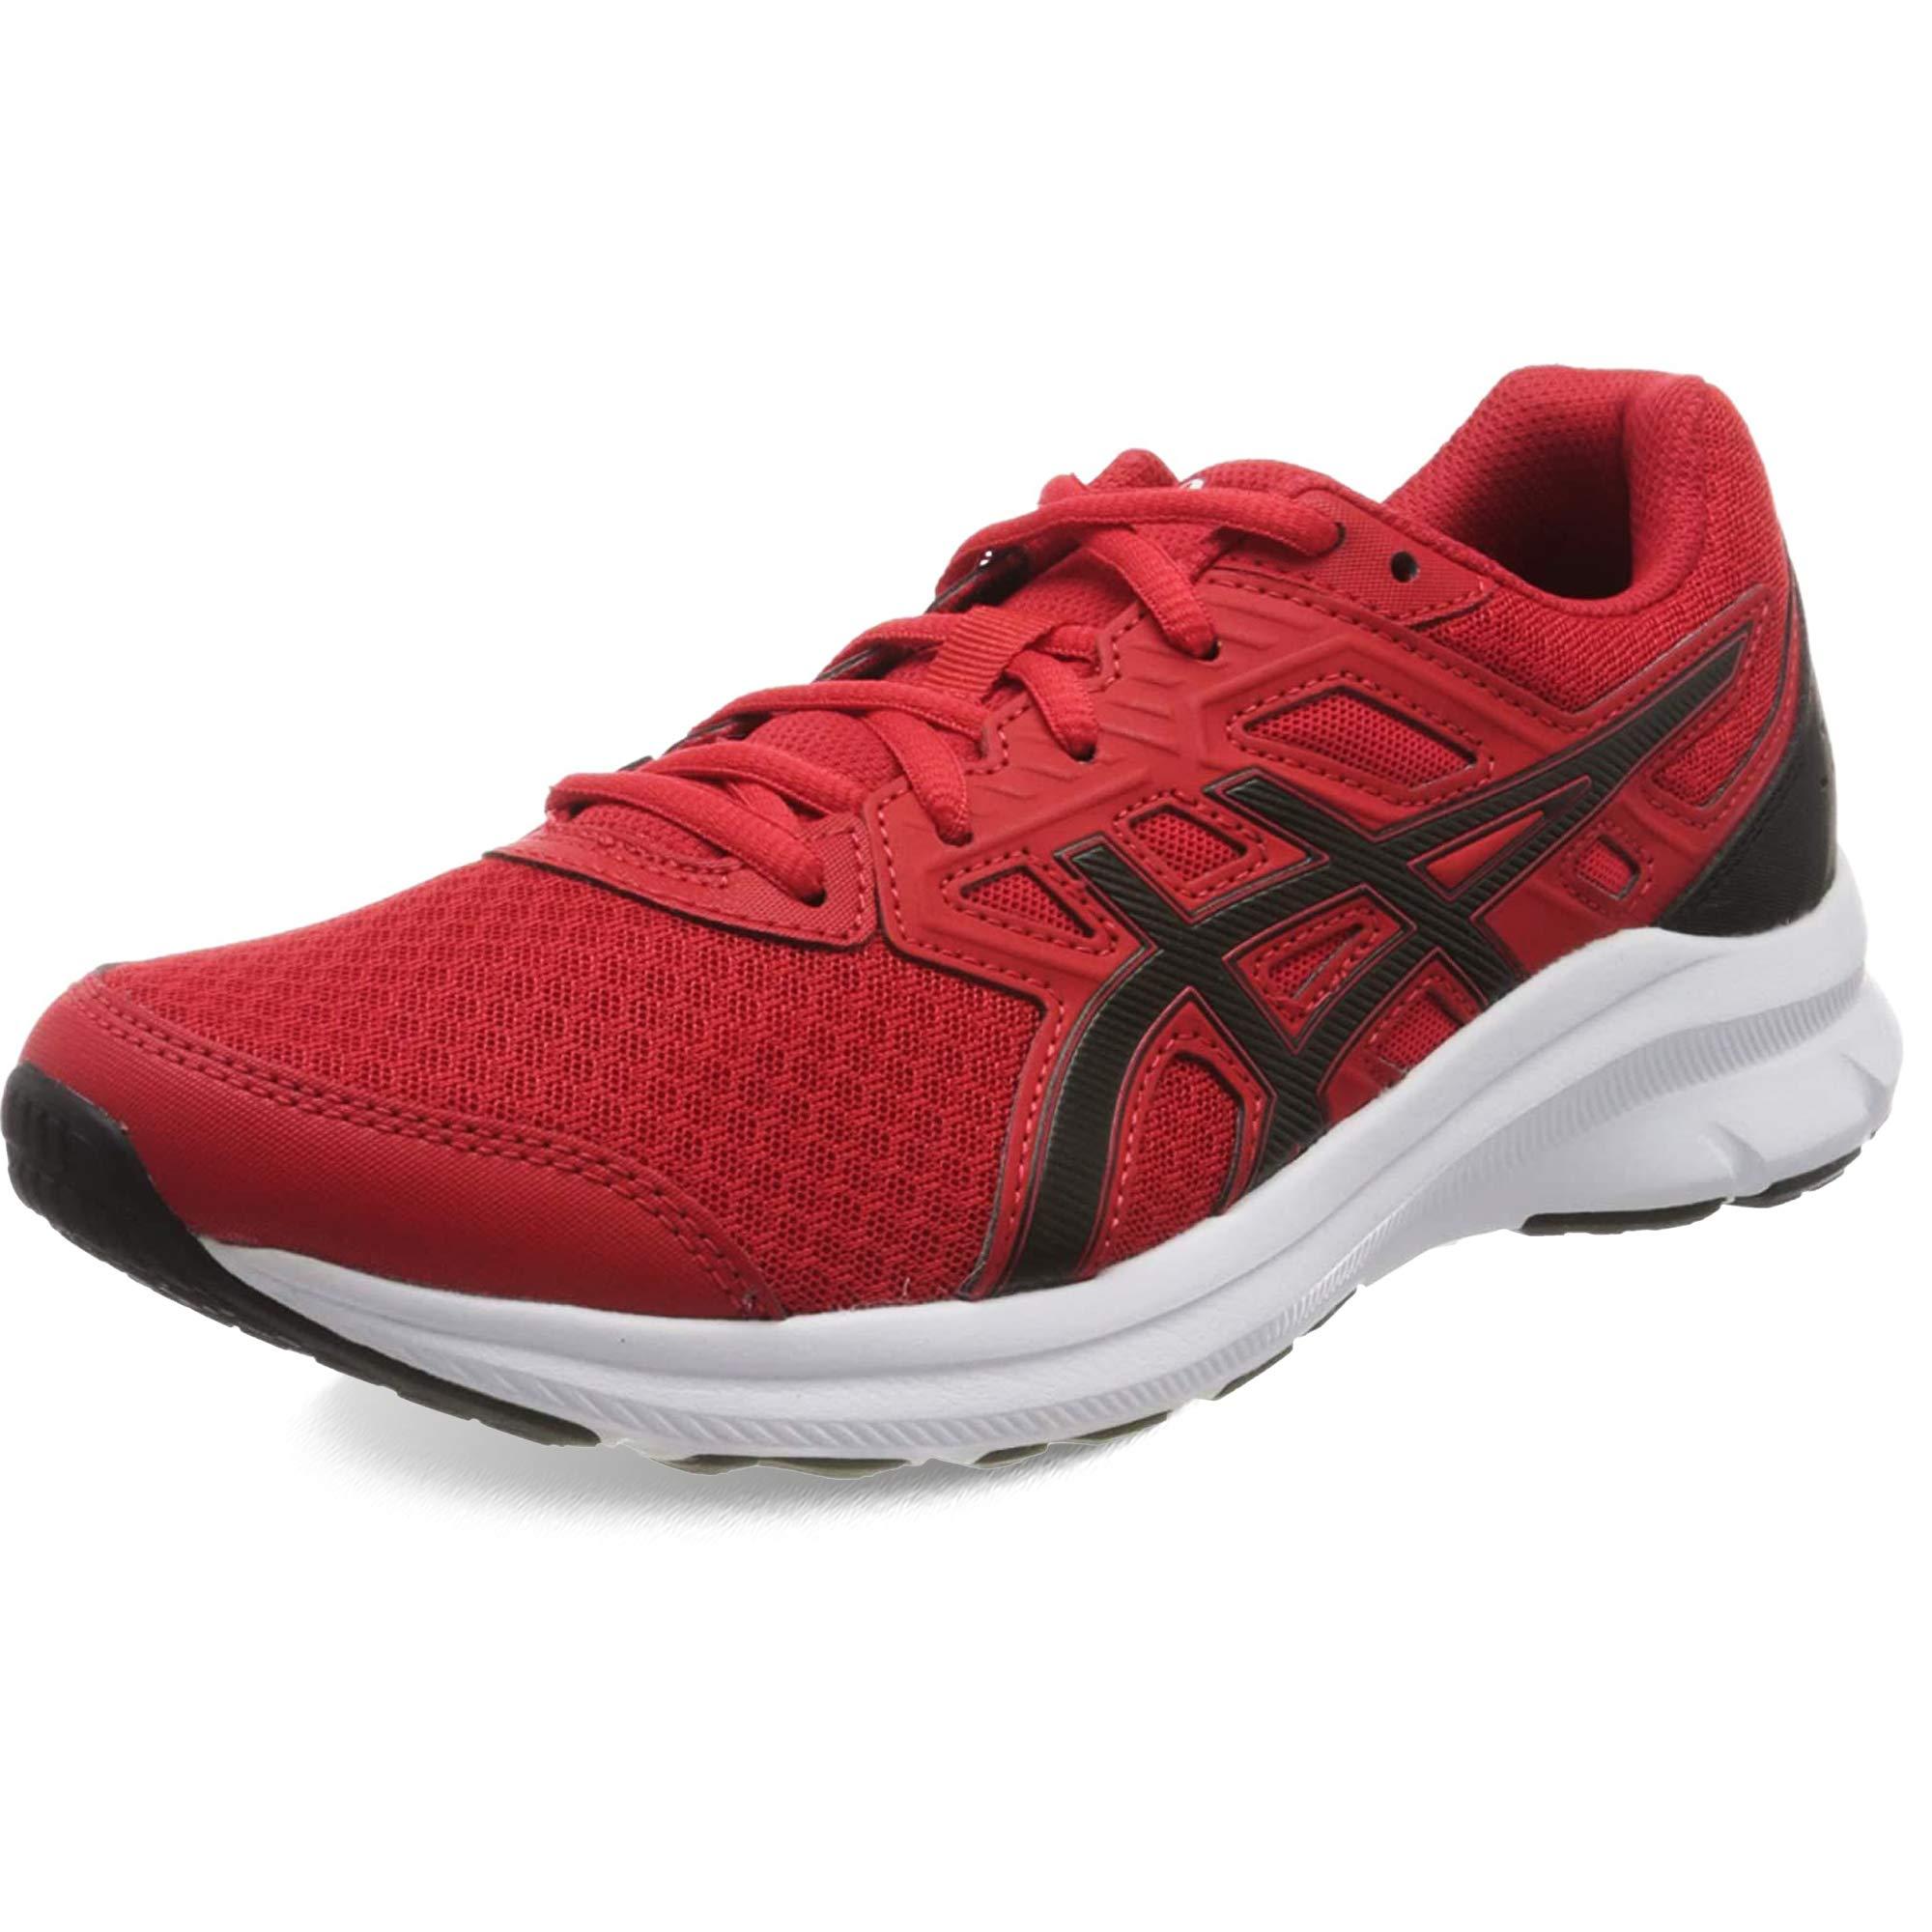 Men's Jolt 3 Running Shoe